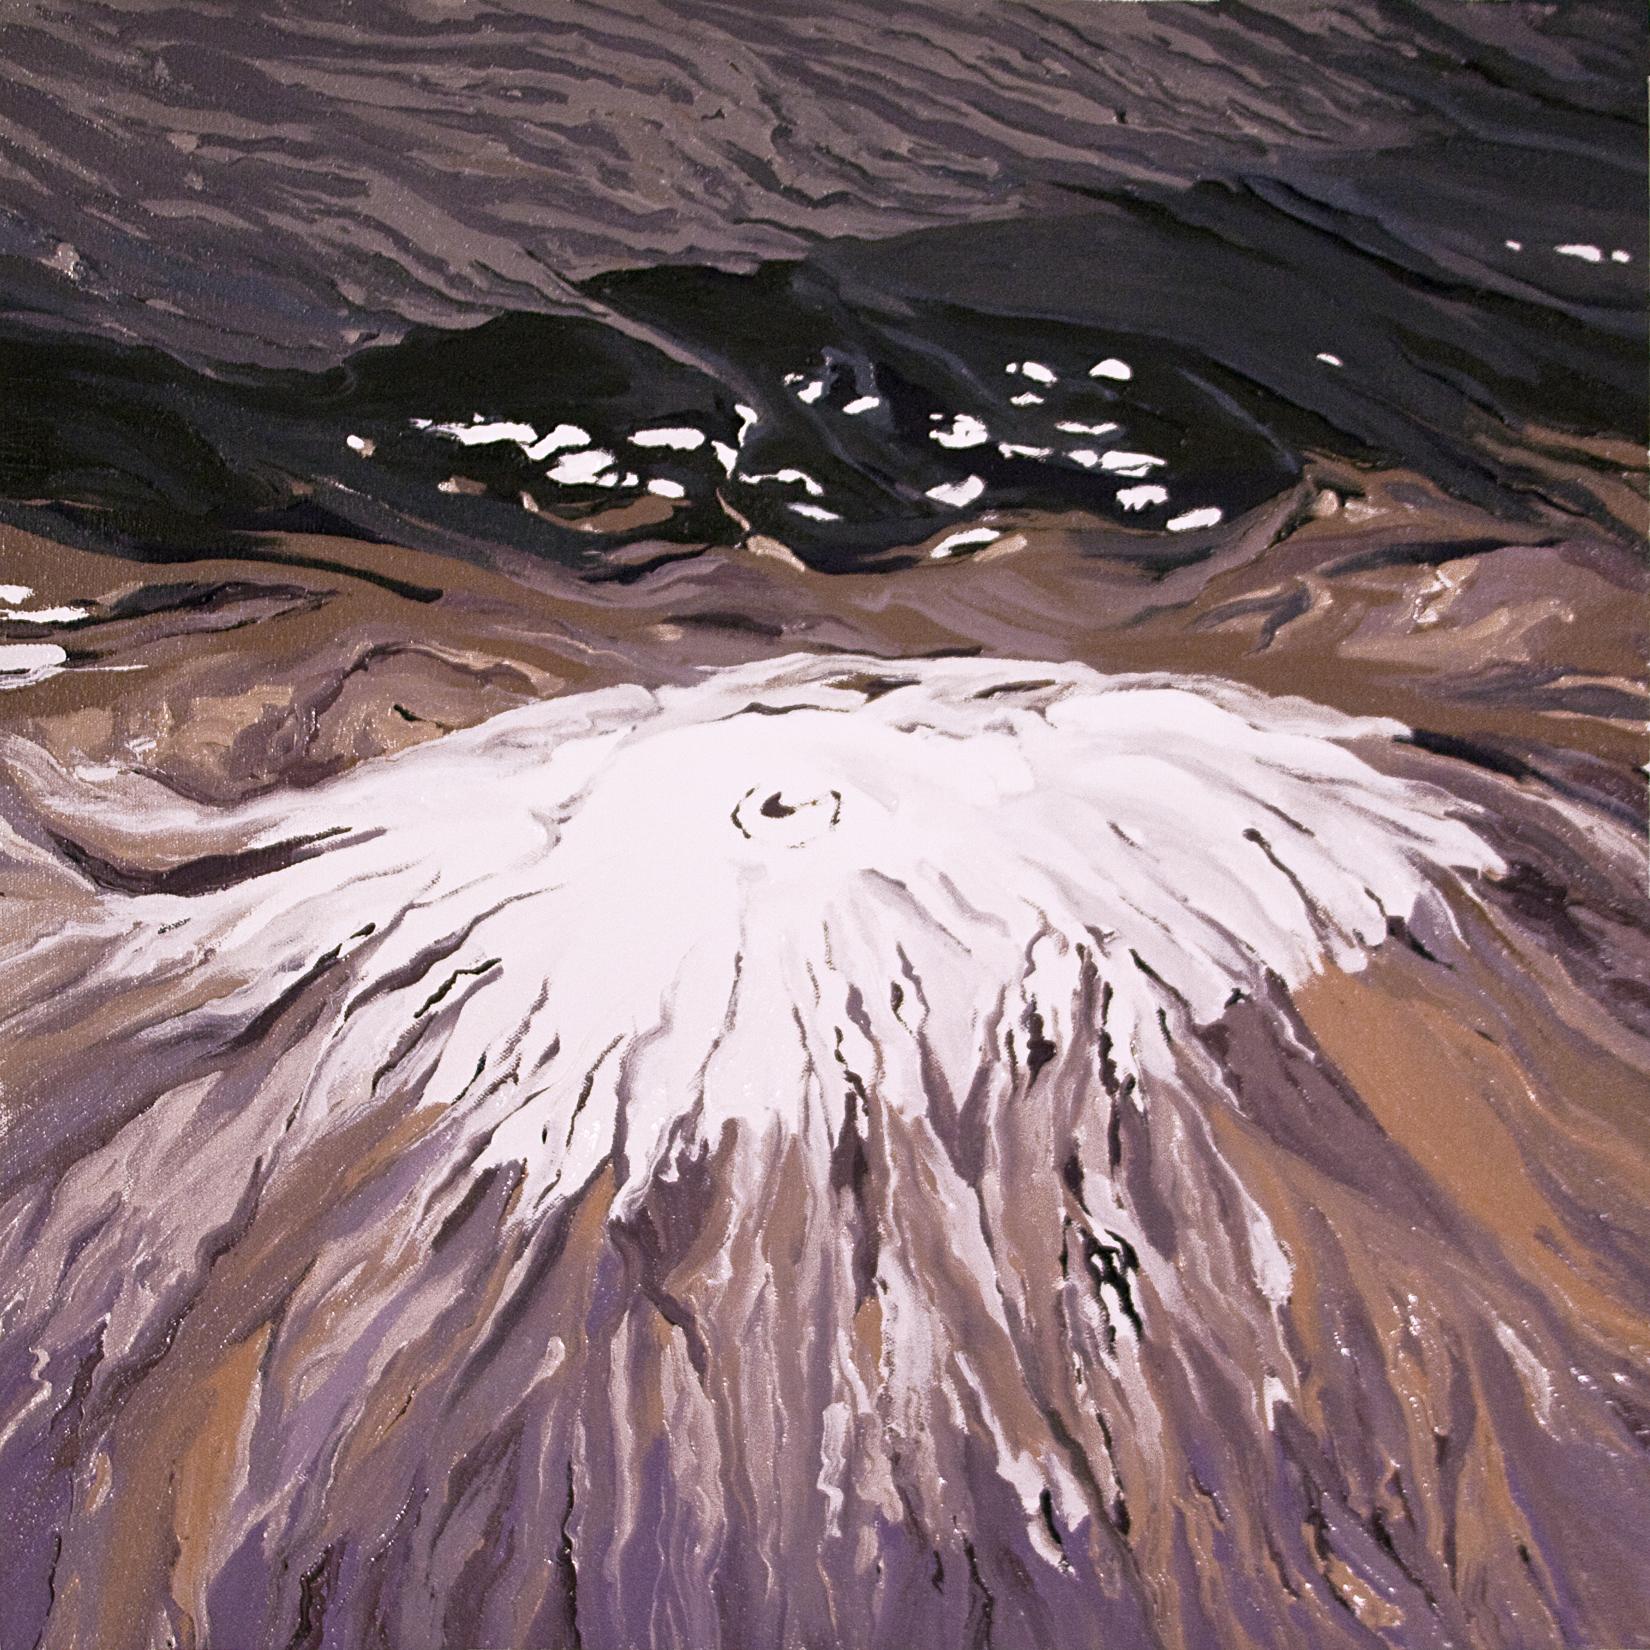 Kilimanjaro #5, 1993, from NASA Earth Observatory